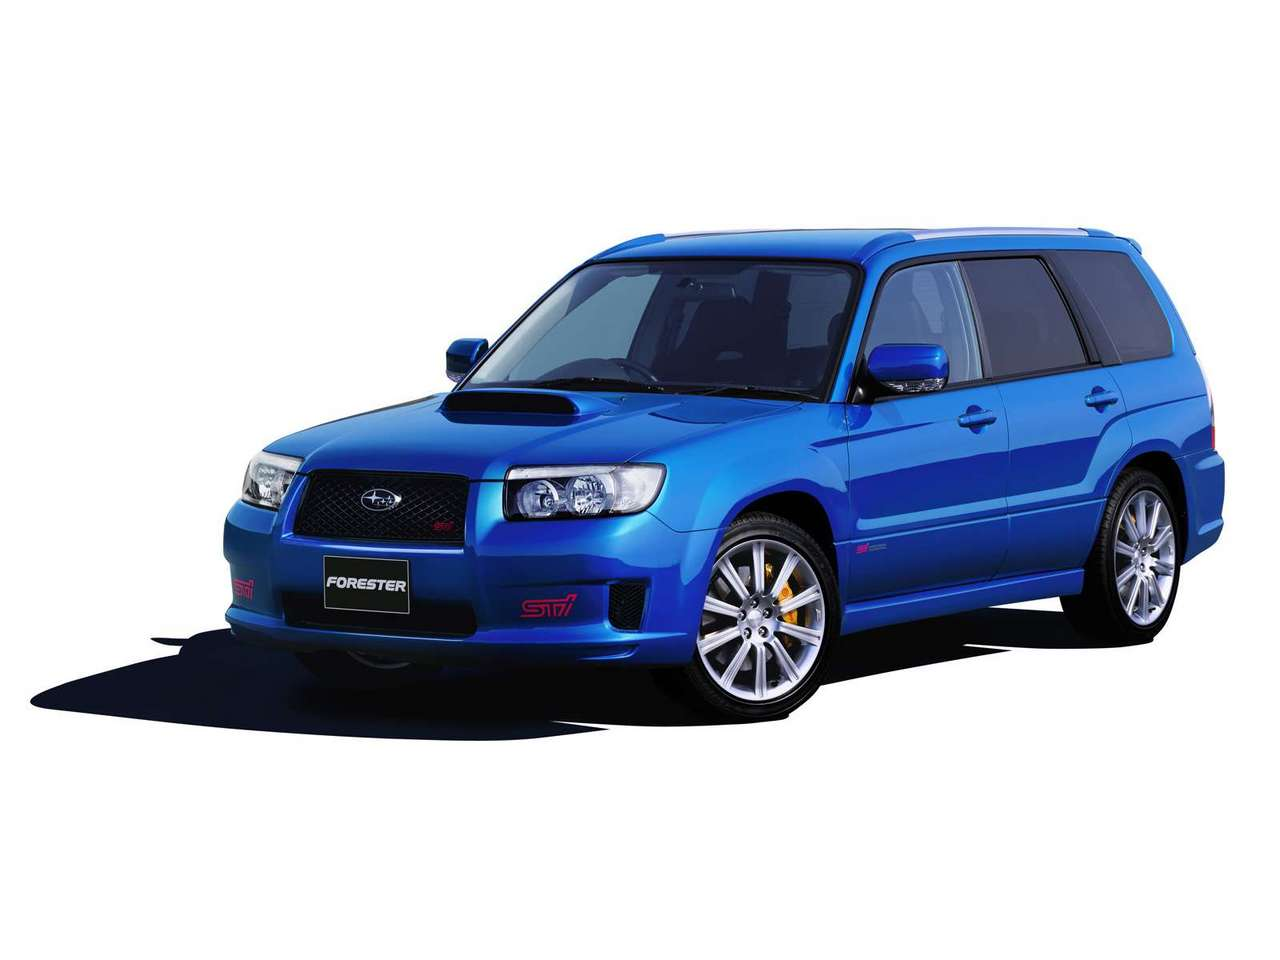 Subaru Forester, Subaru, Forester, Subaru 4x4, 4x4, crossover, off road, Japan, Japanese car, motoring, automotive, car, cars, ebay motors, autotrader, classic car, retro car